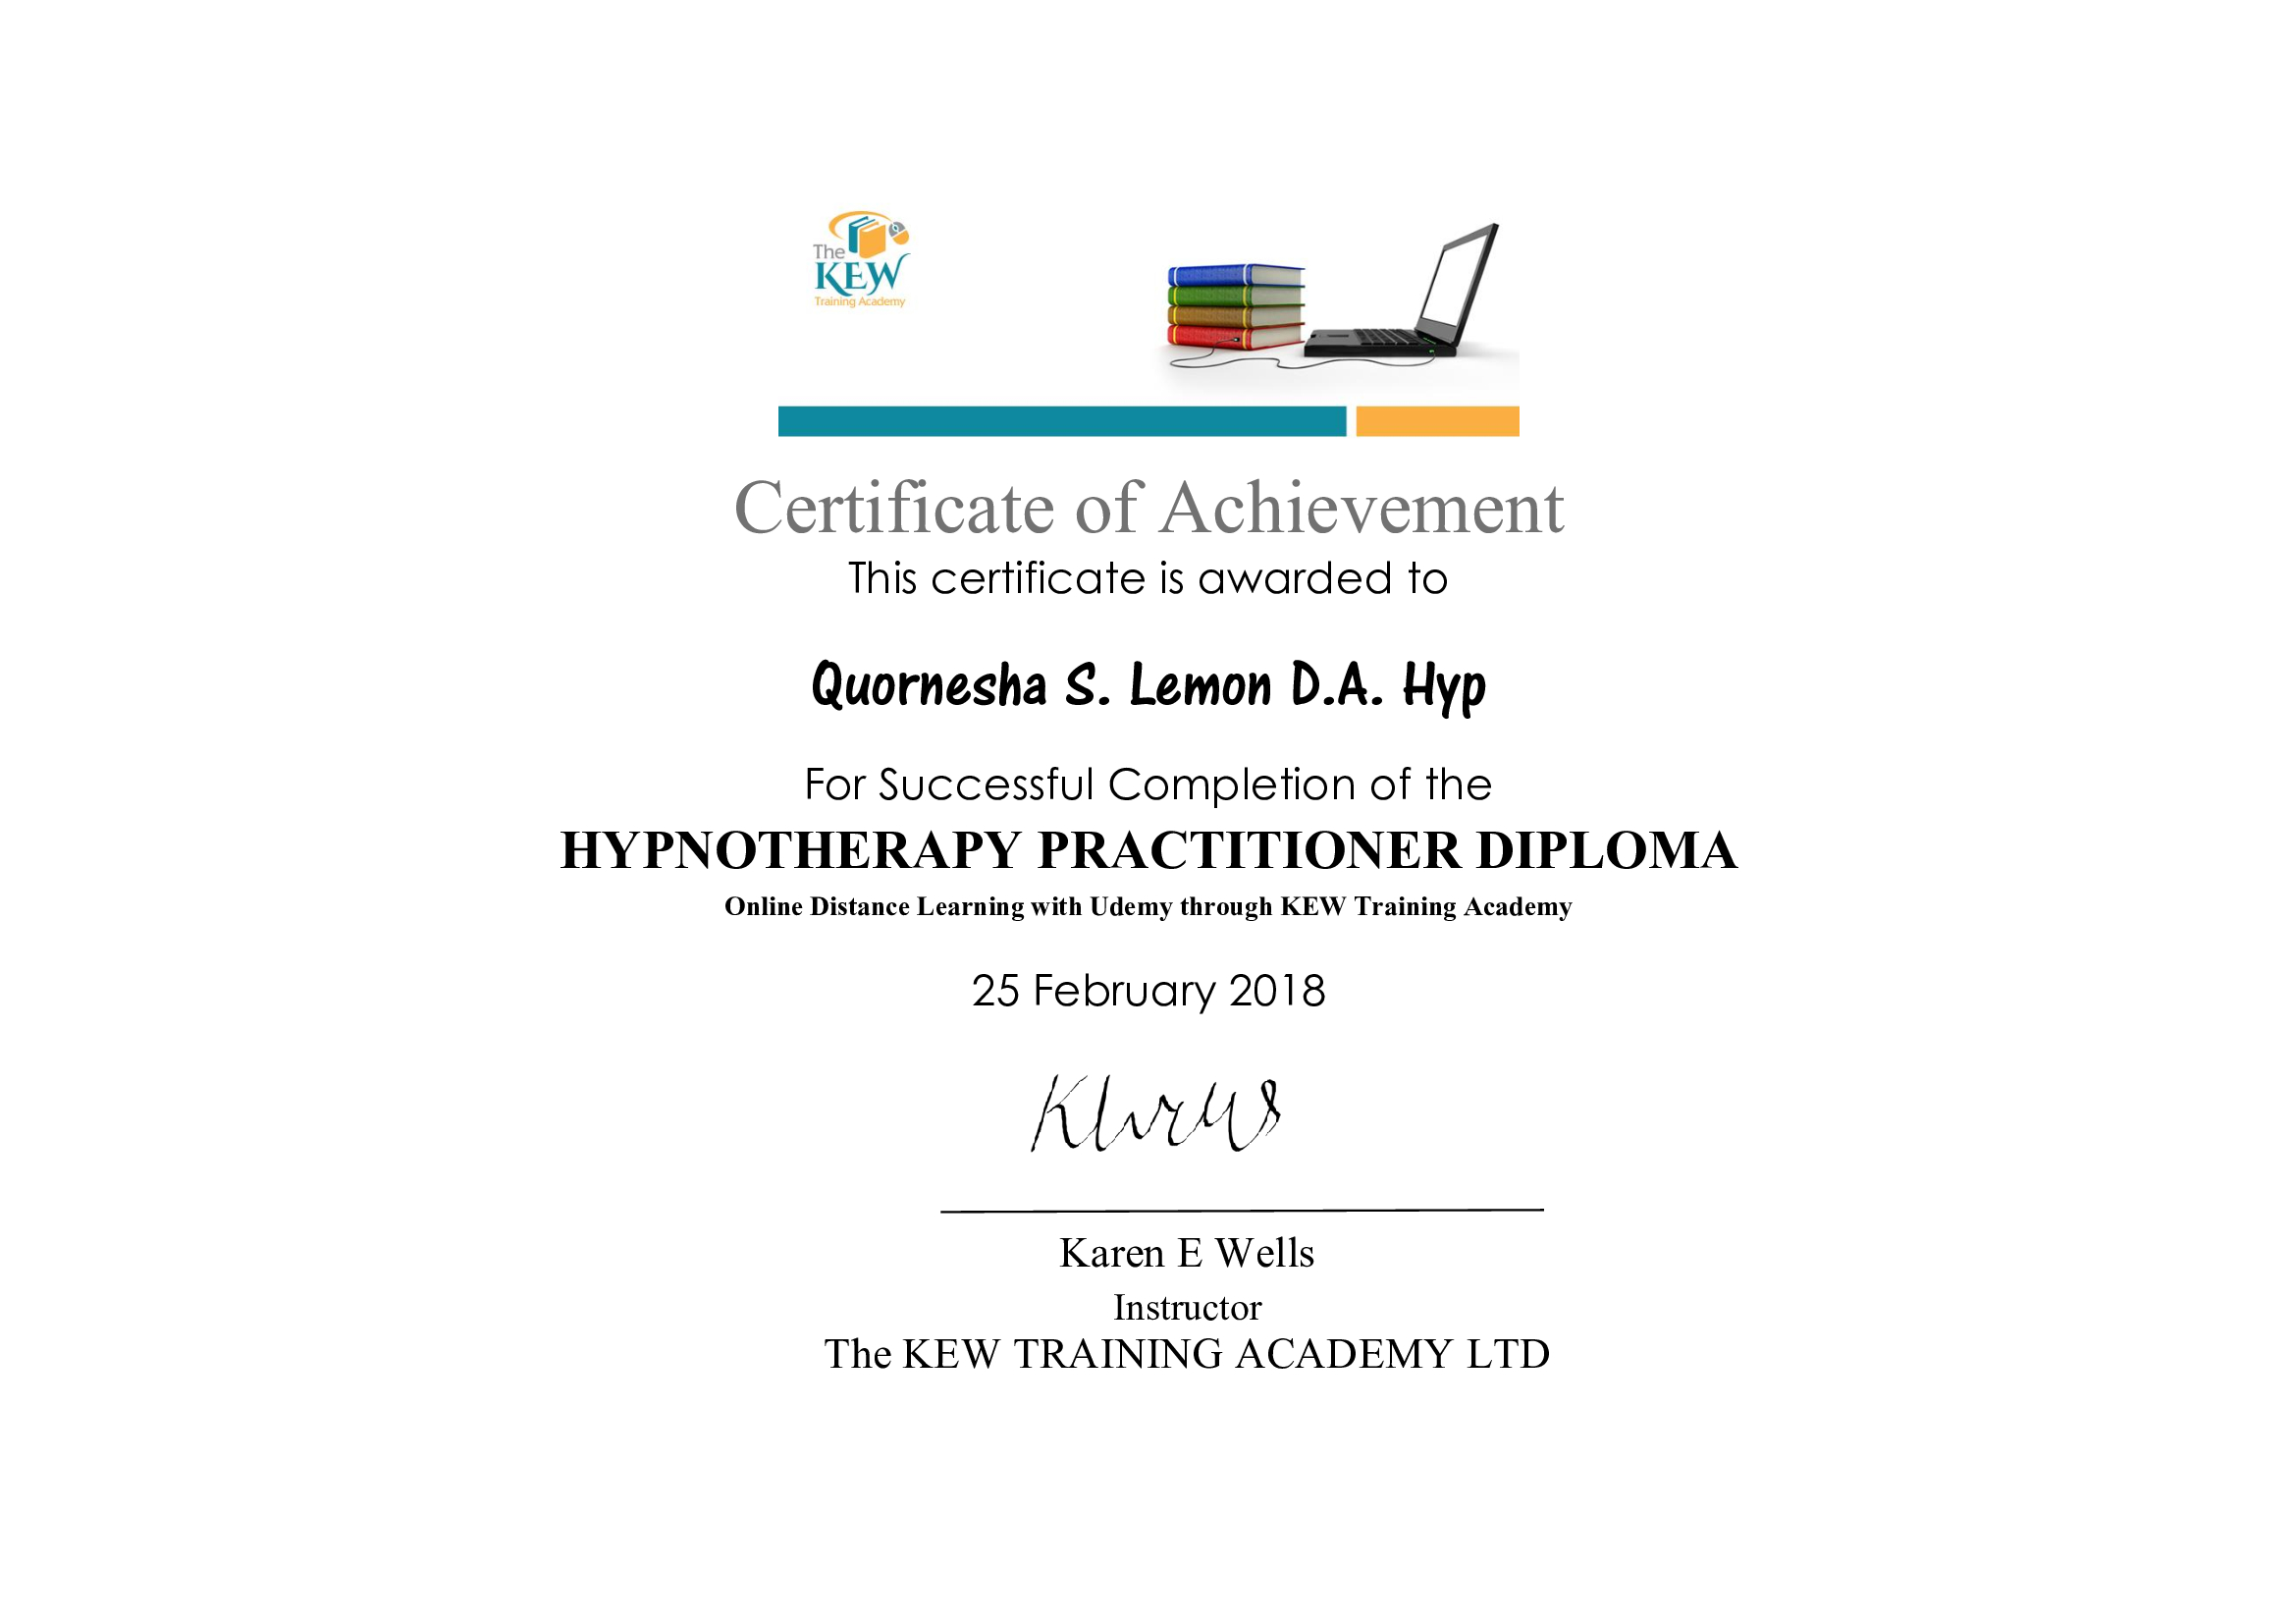 HYPNOTHERAPY_Diploma_Quornesha_S_Lemon.jpg